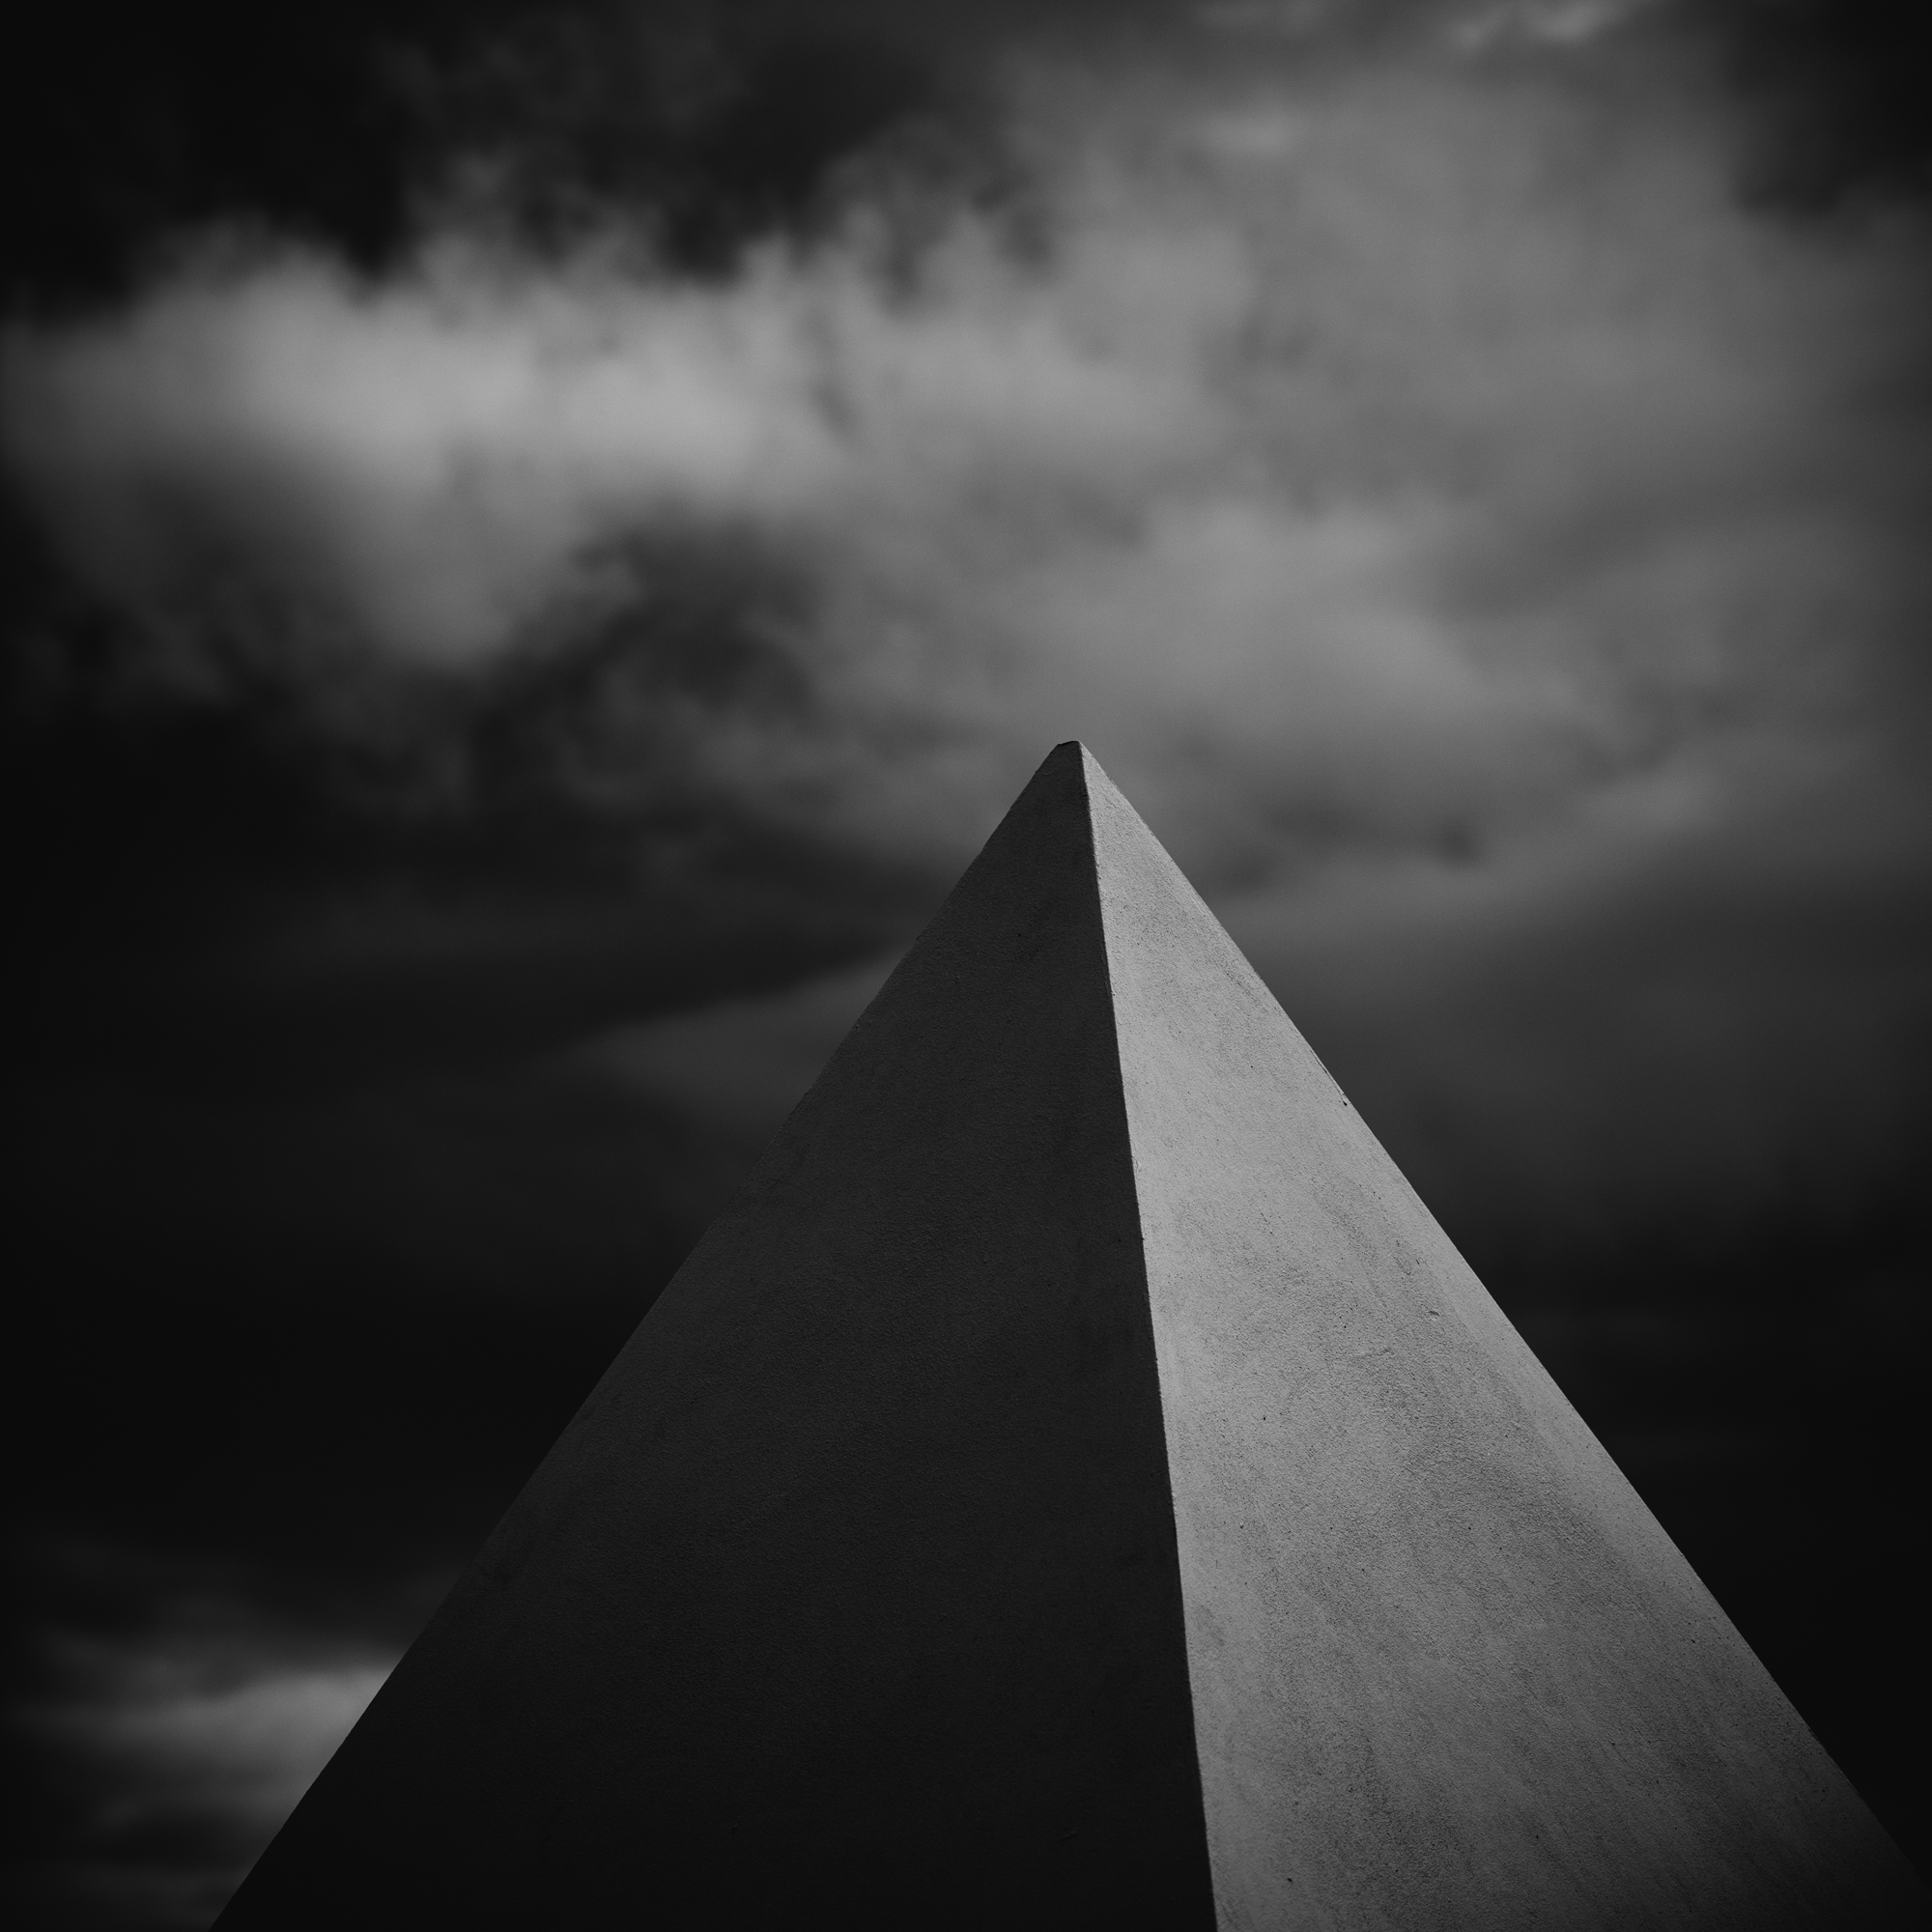 Carlos_Detres_Photography_75252015-02-16.jpg